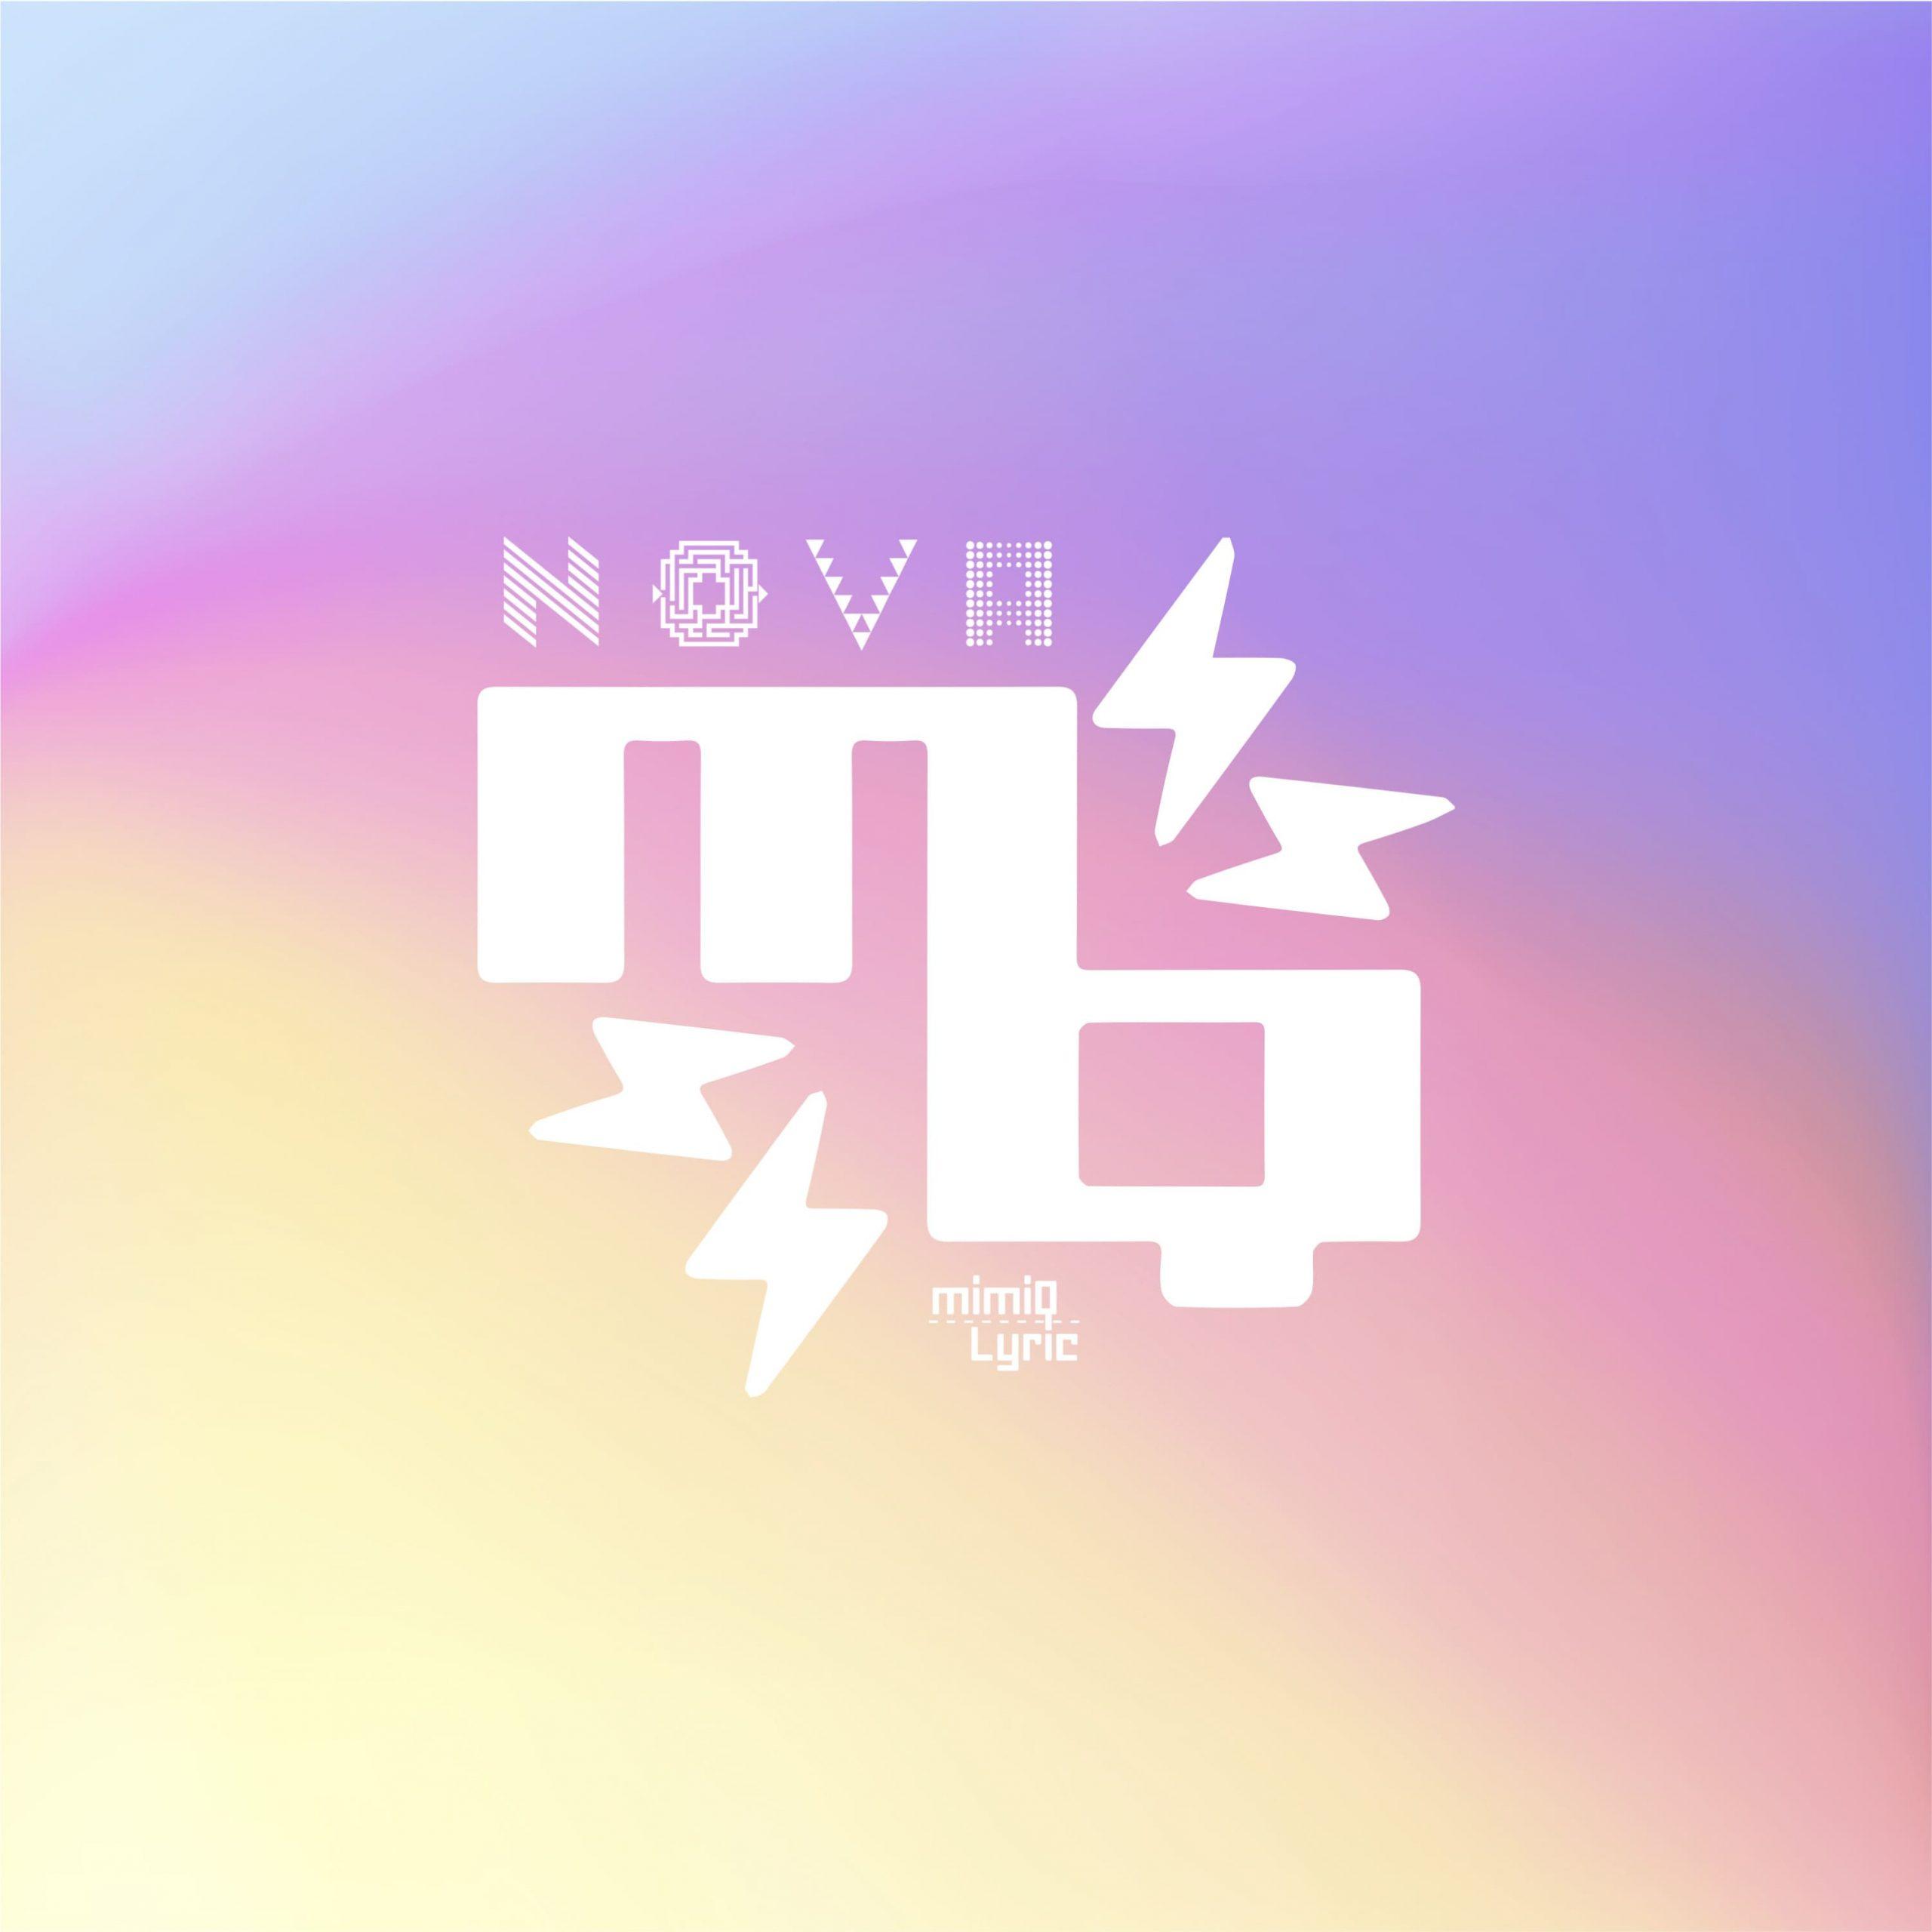 [mimiQ_Lyric] NOVA